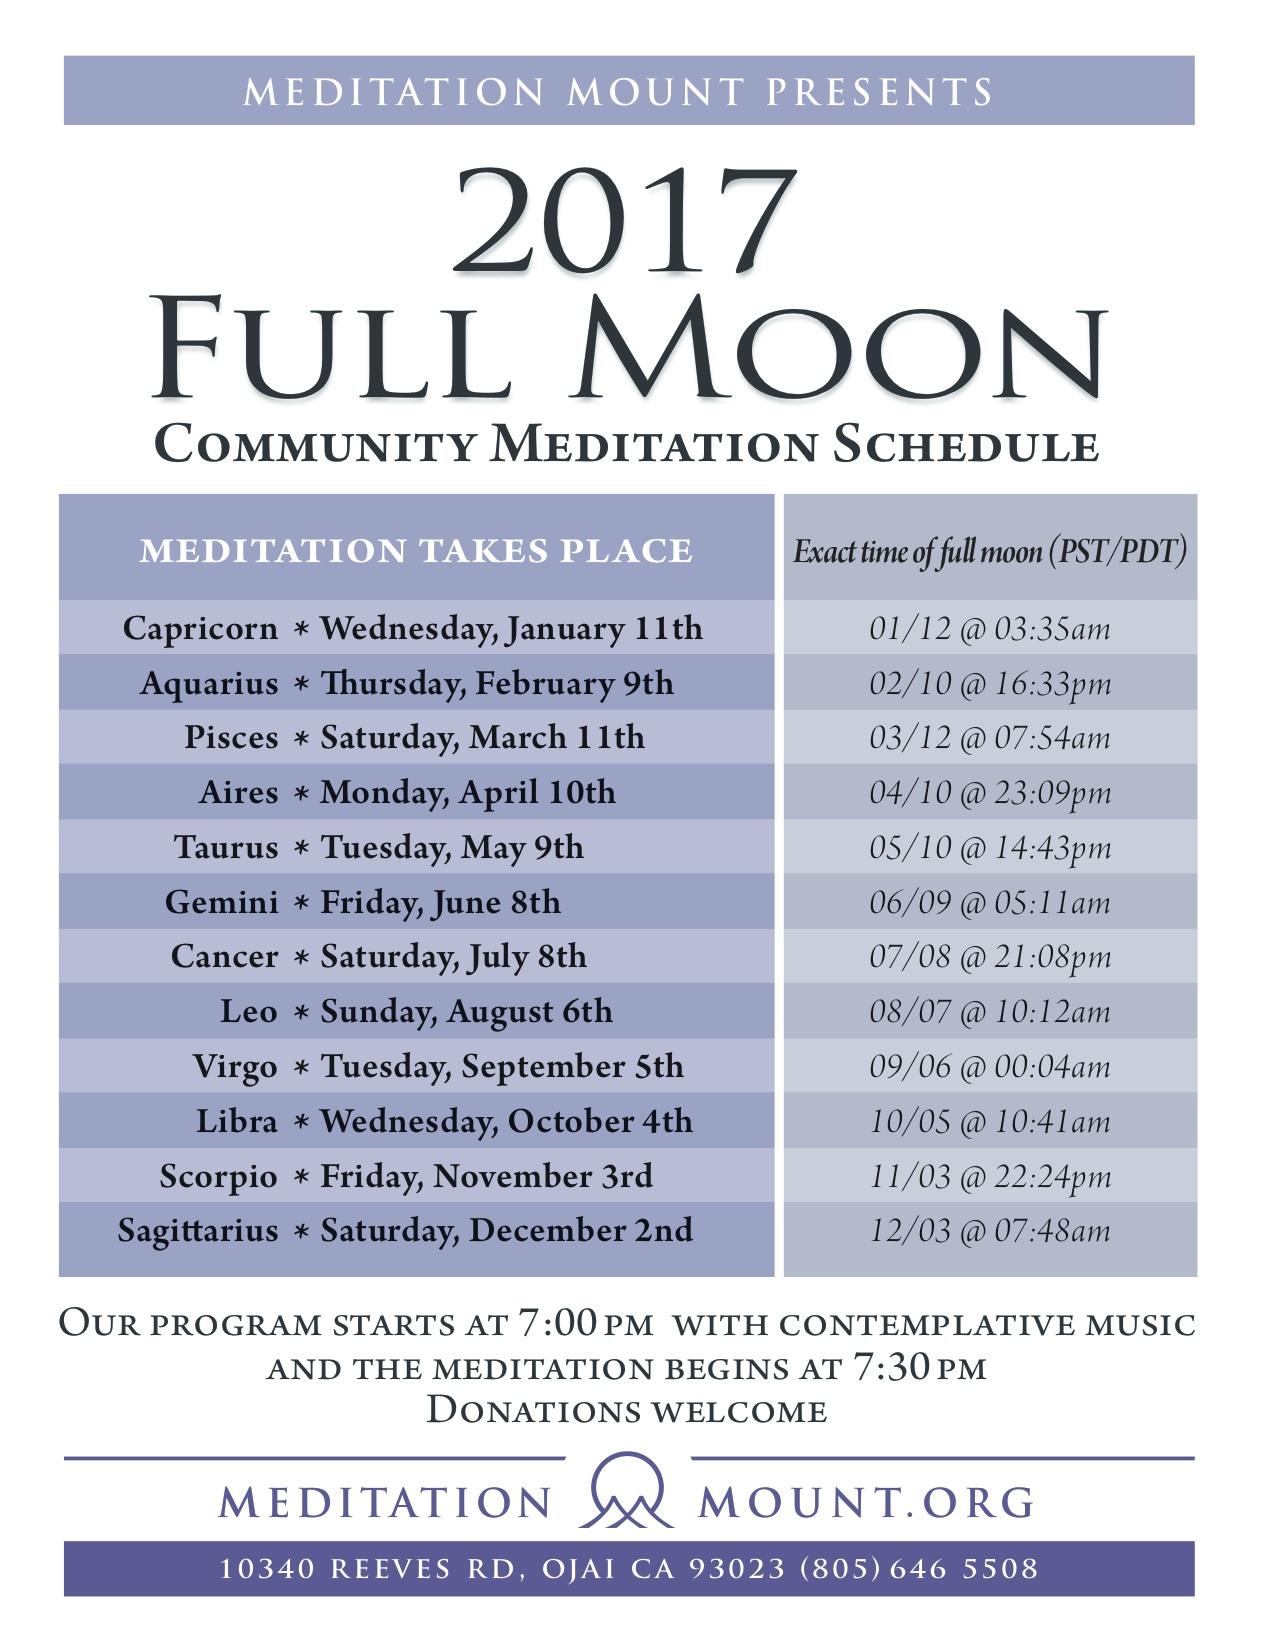 2017 Full Moon Schedule Meditation Mount